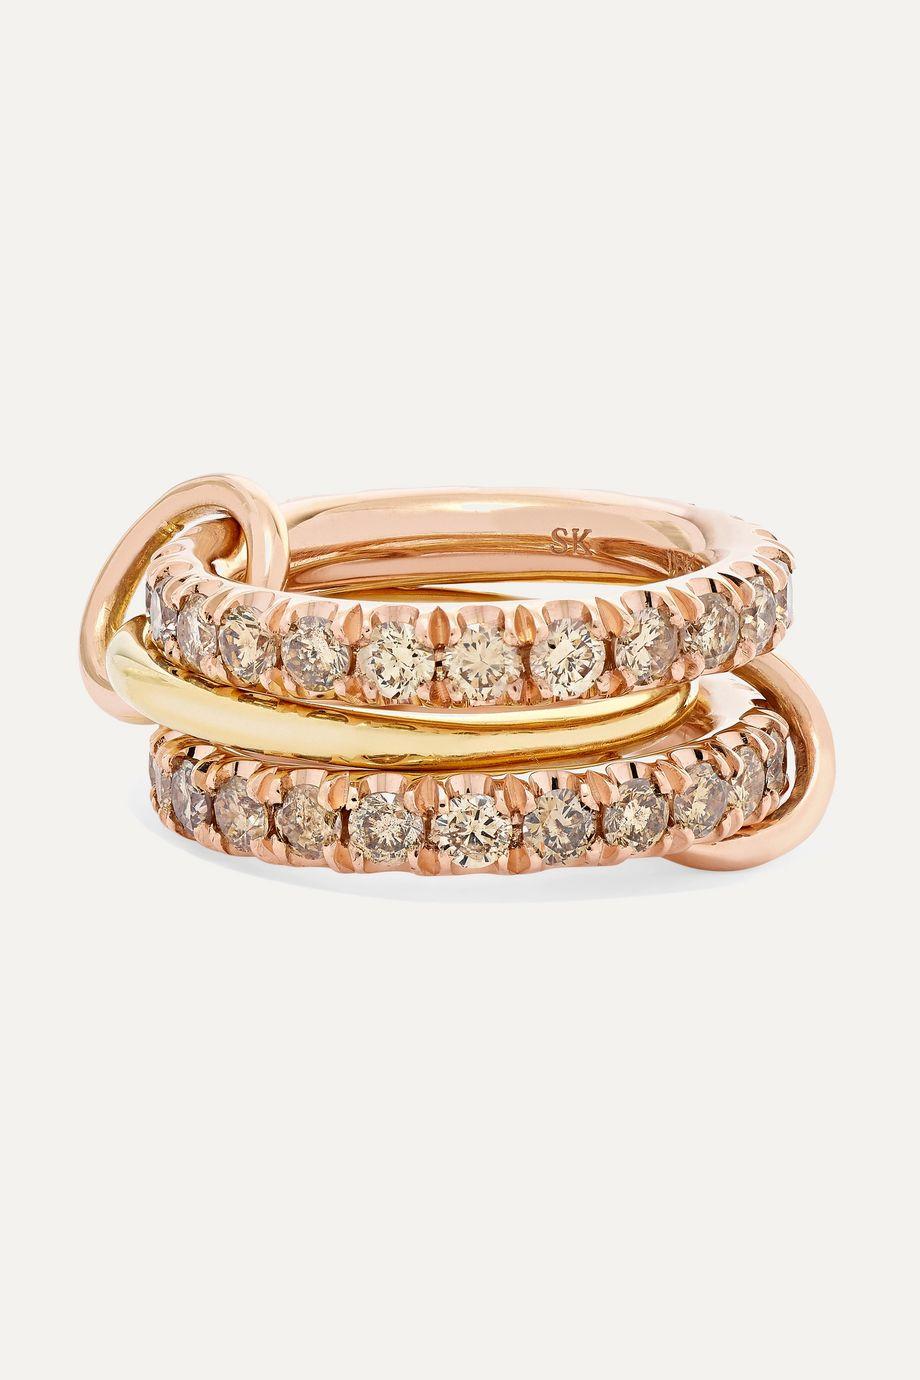 Spinelli Kilcollin Juno Rose set of three 18-karat yellow and rose gold diamond rings